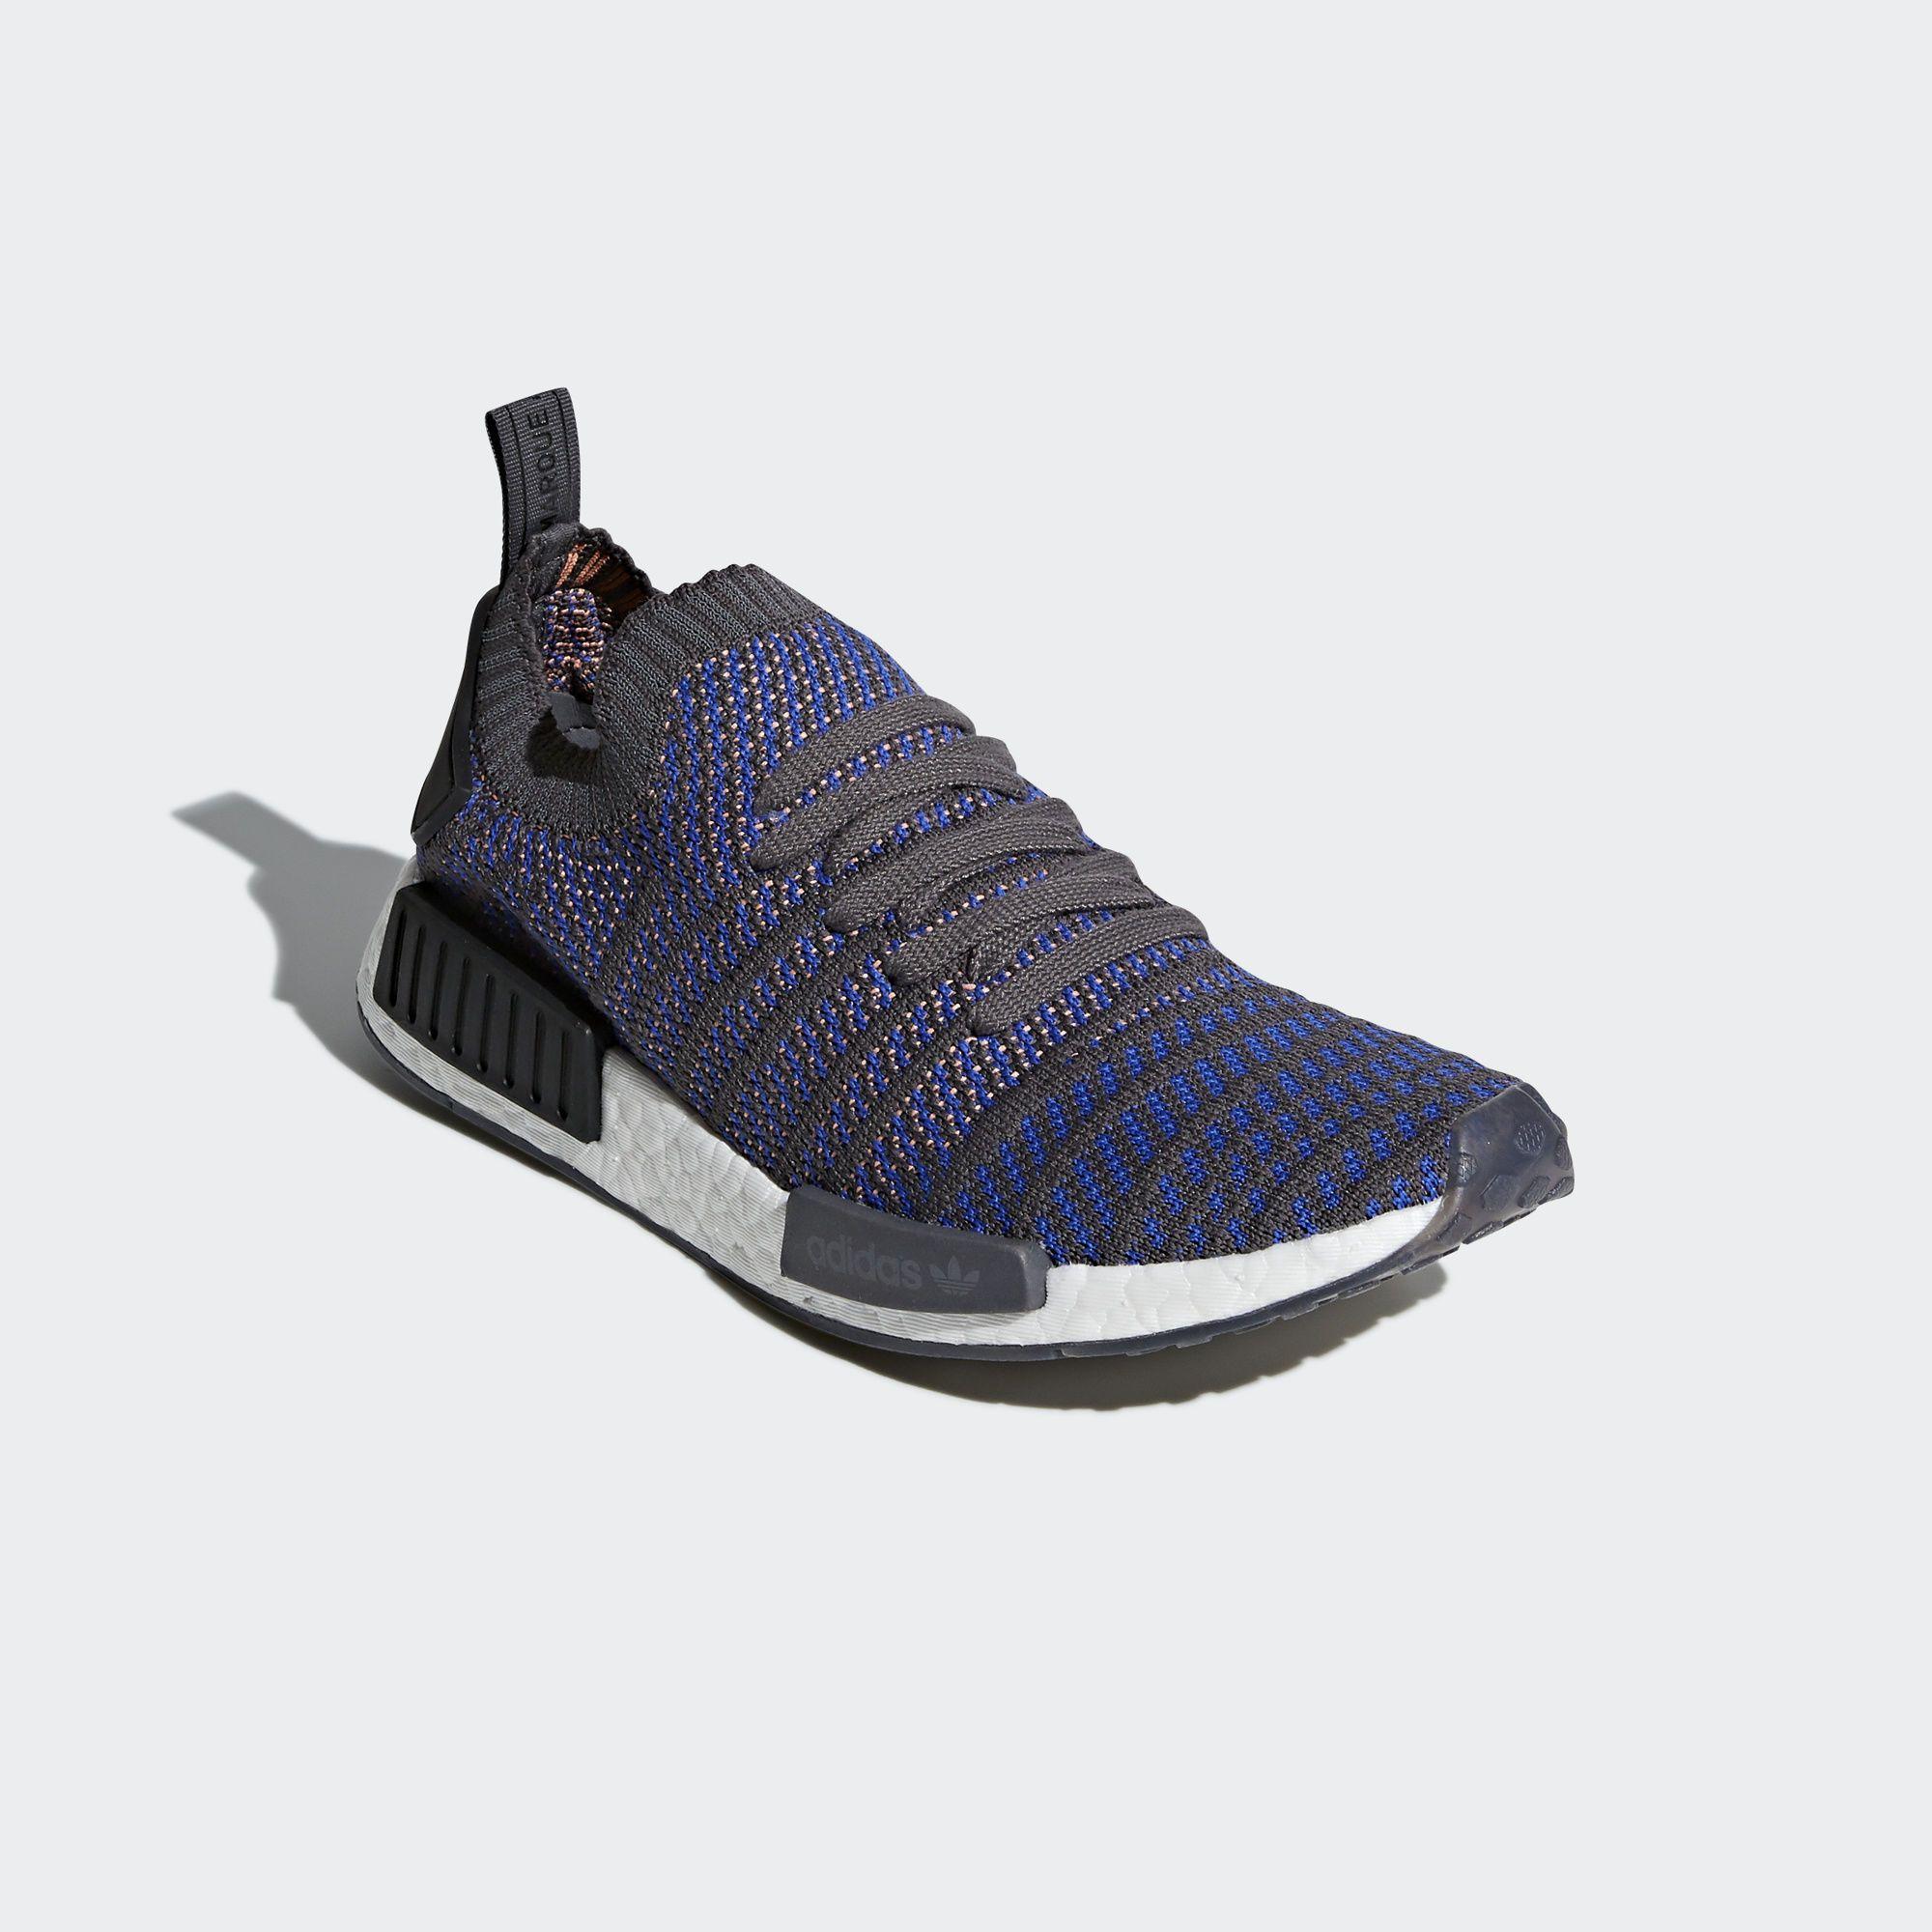 adidas NMD_R1 STLT Primeknit Shoes - Blue | adidas Australia | Nmd ...